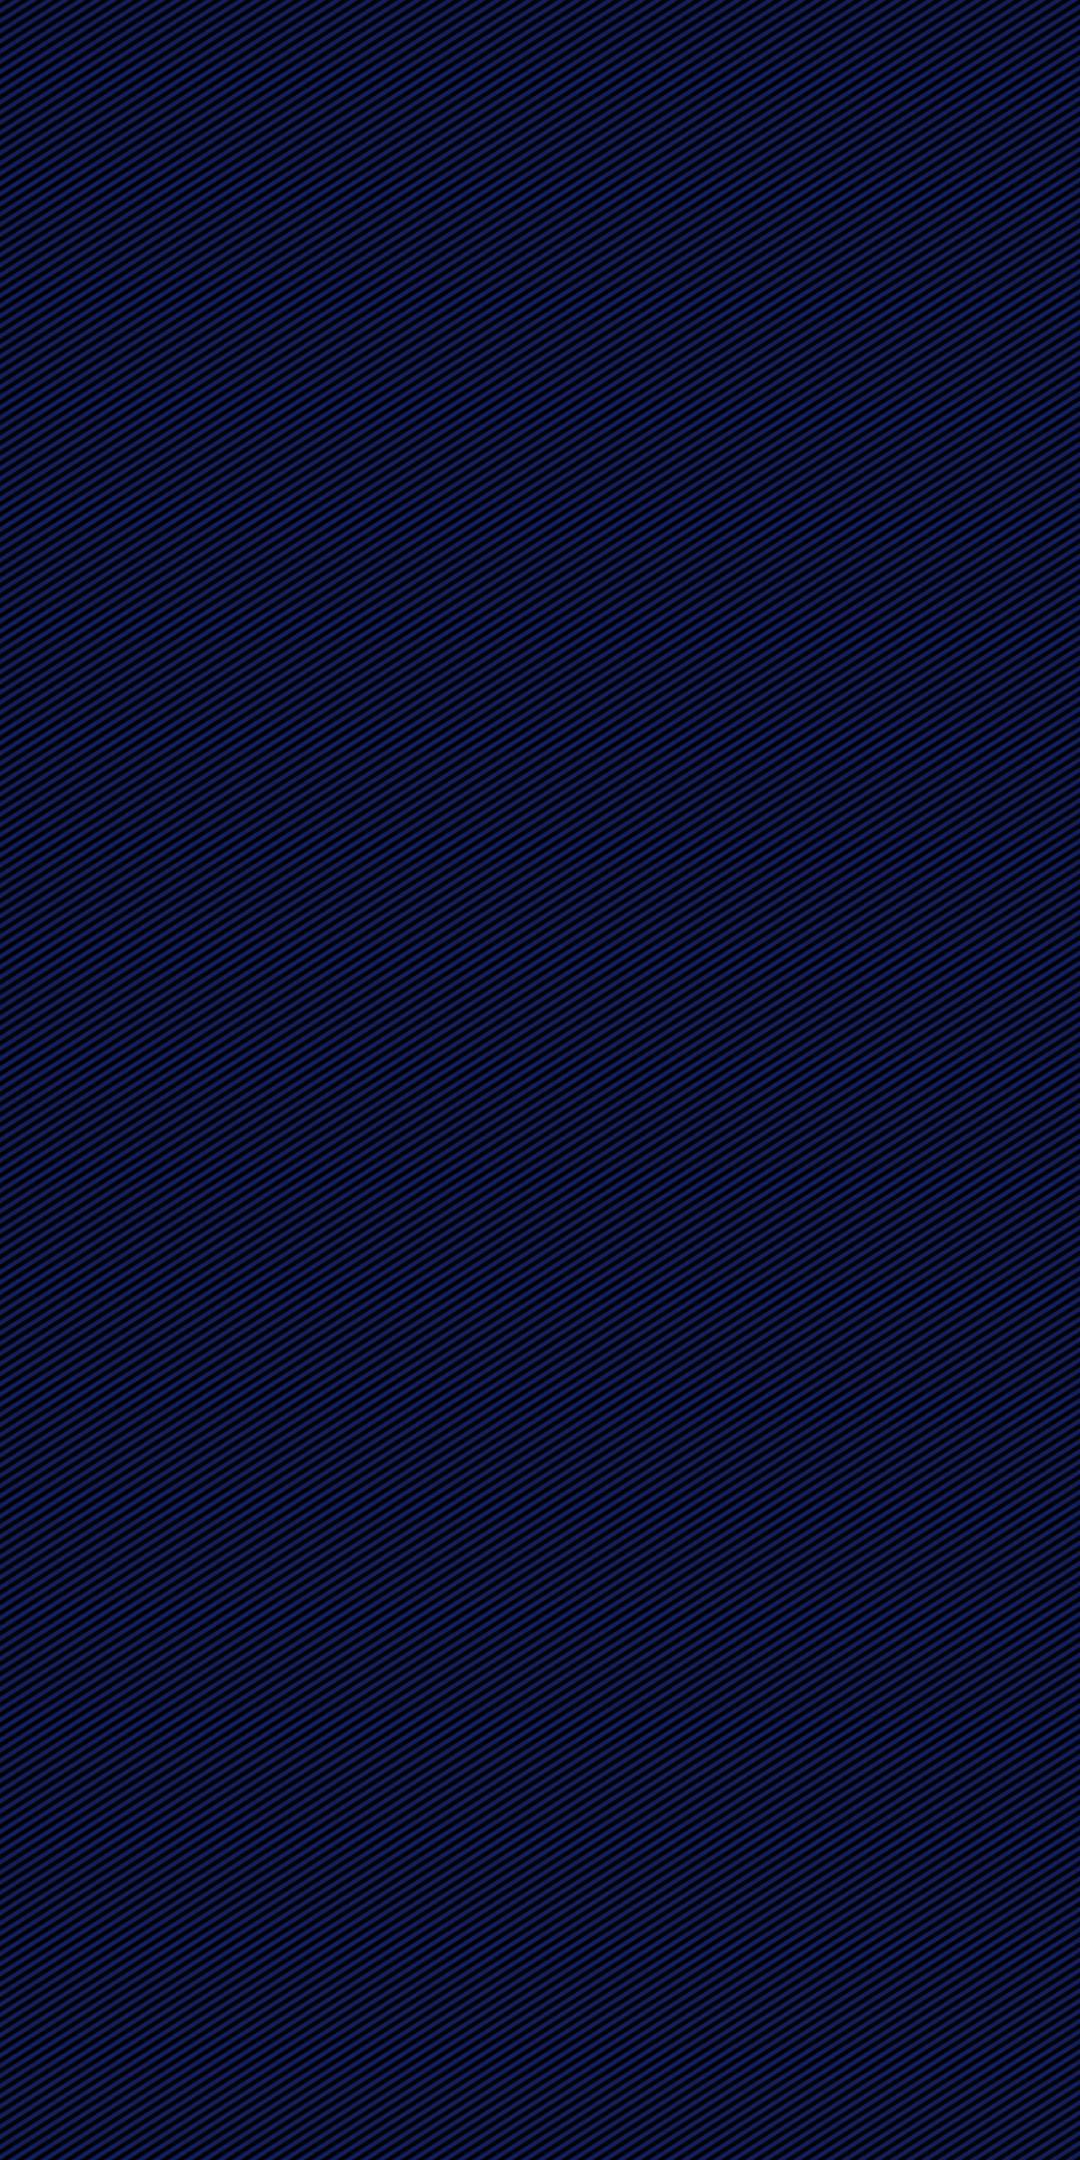 MIUI 10 Stock Wallpaper 05 - [1080x2160]